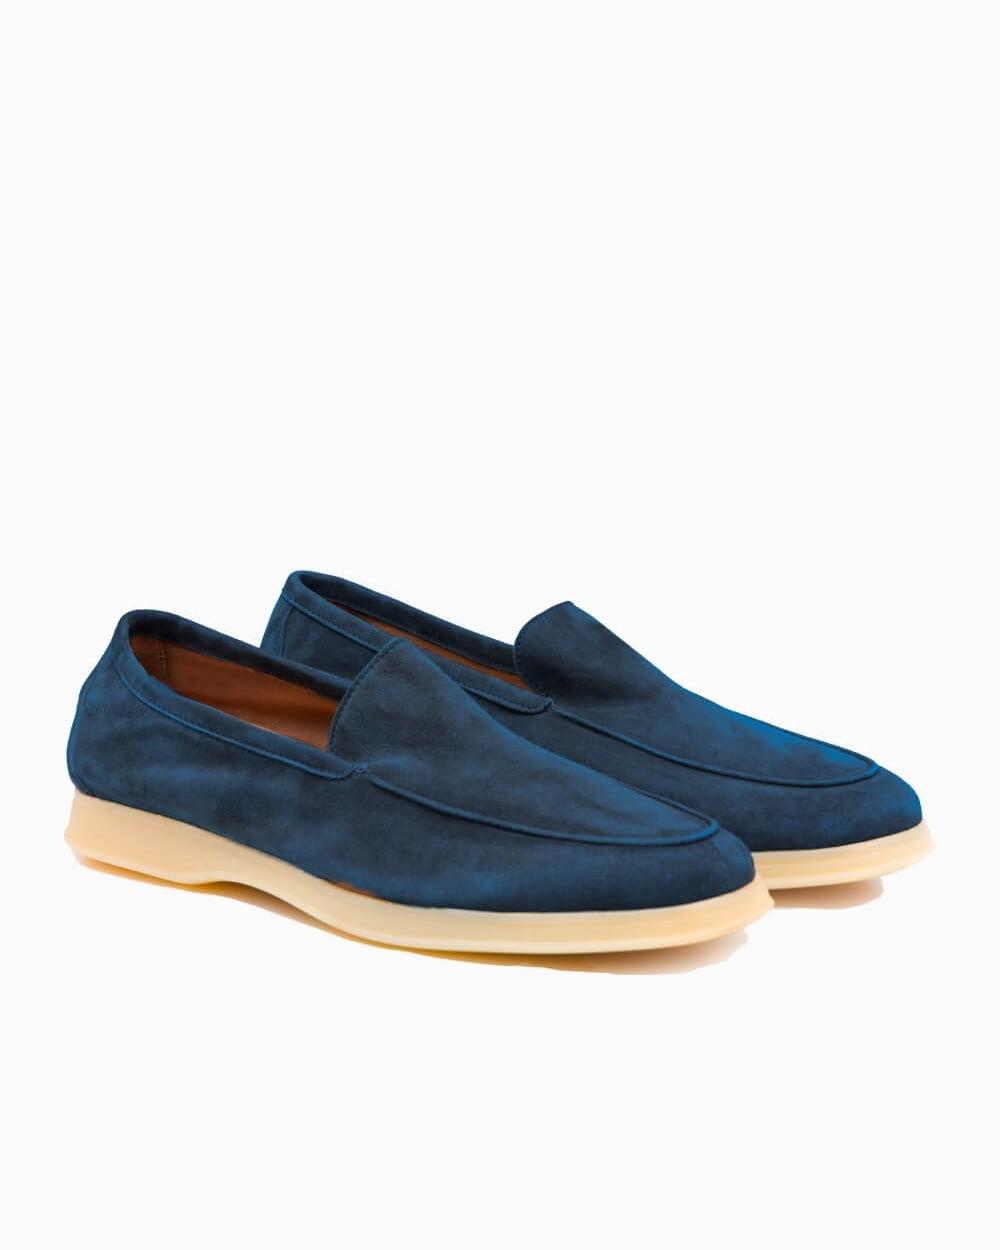 Aquariva-beach-suede-blue-navy-05di05